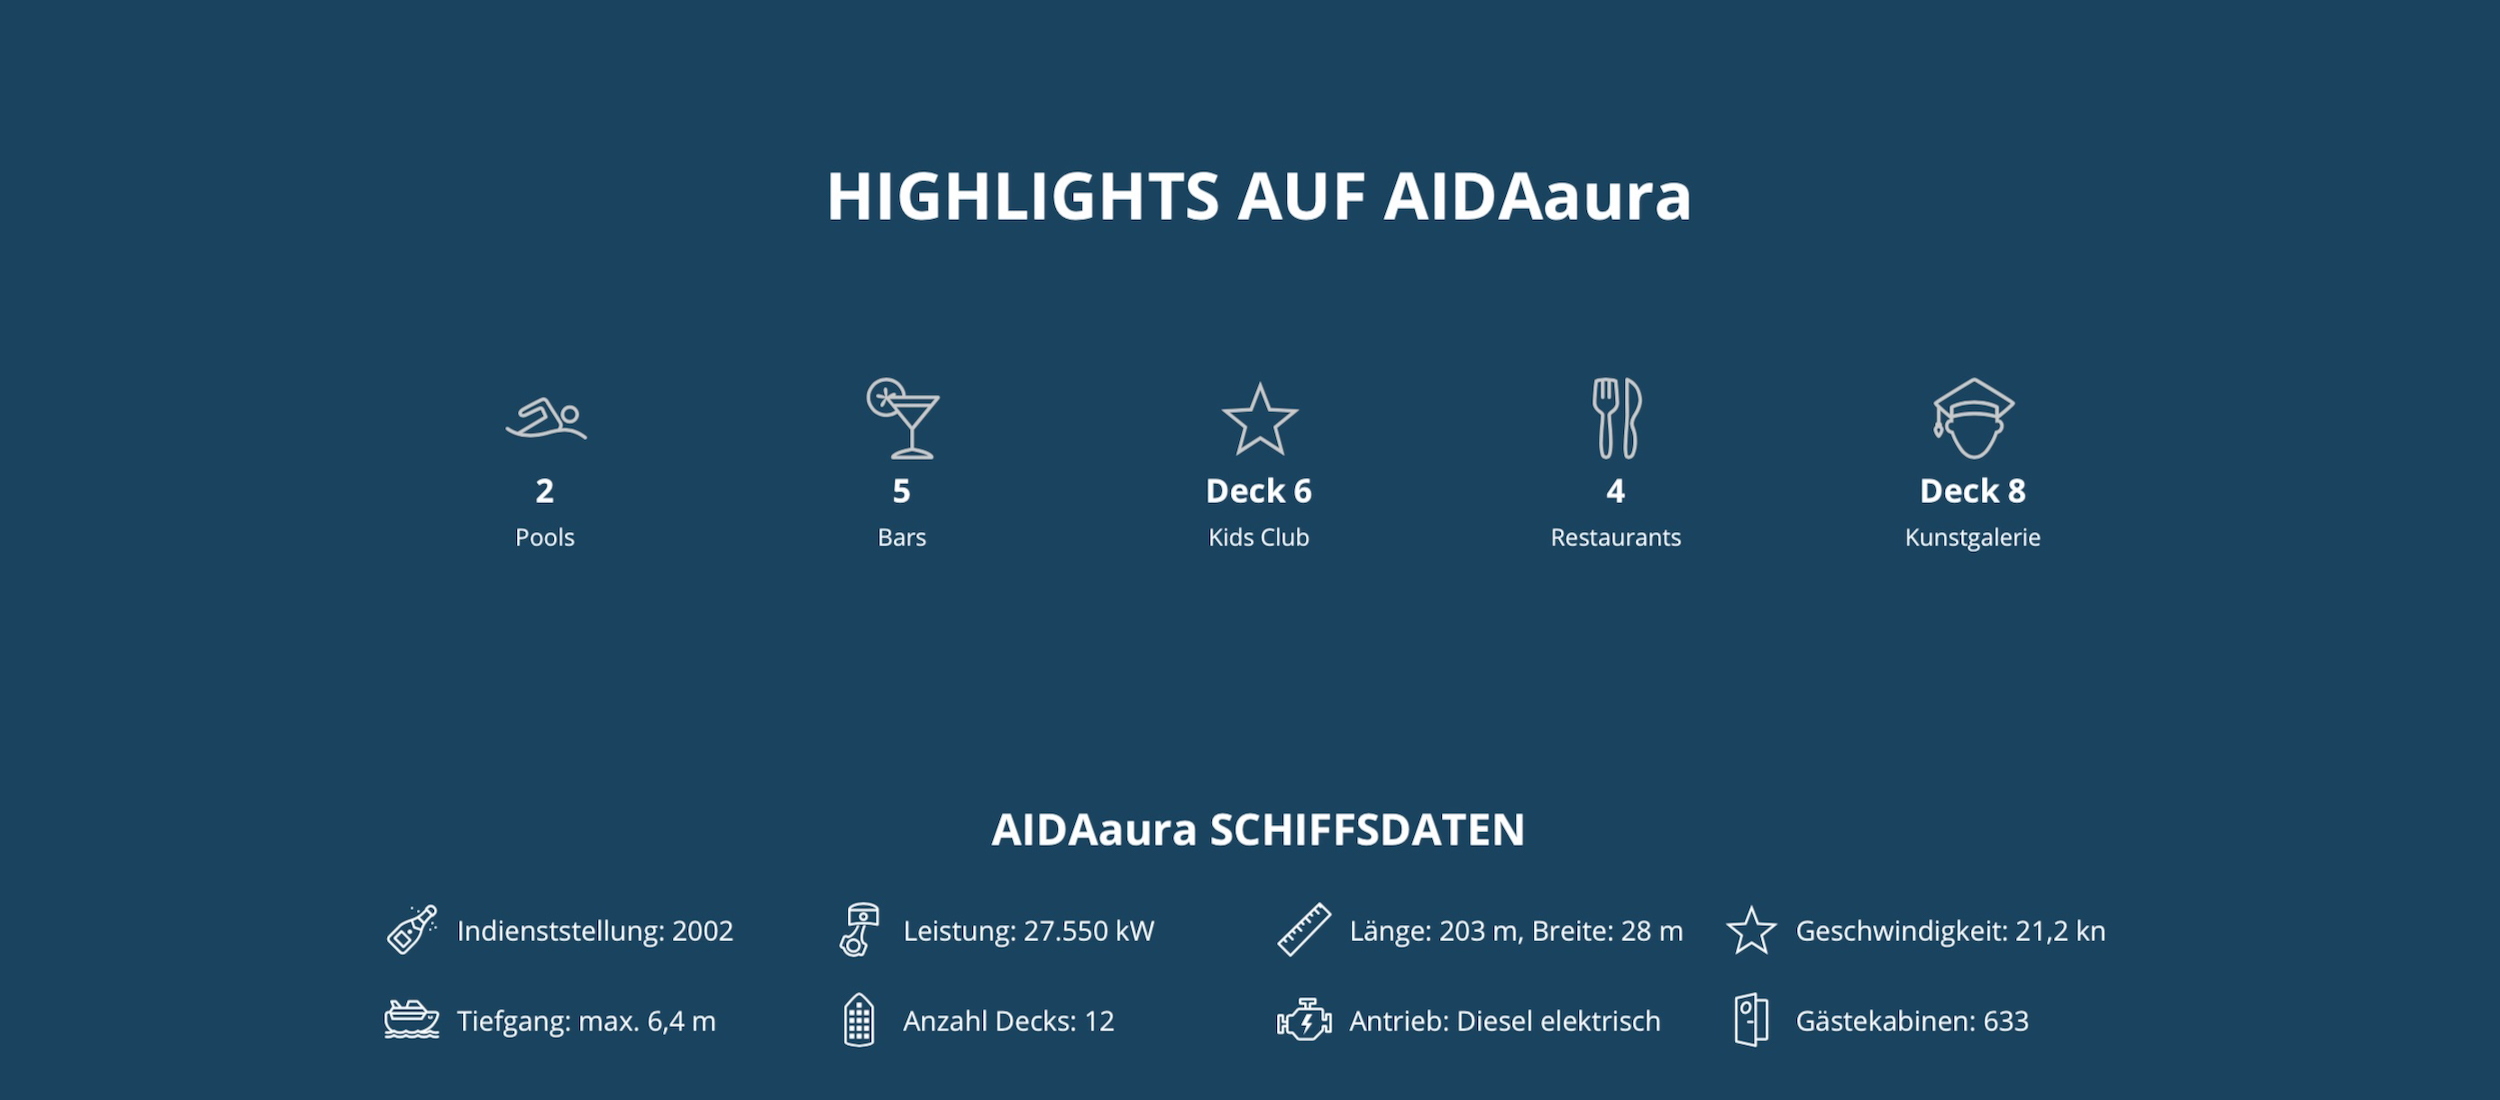 aida-cruises-ships-aidaaura-daten